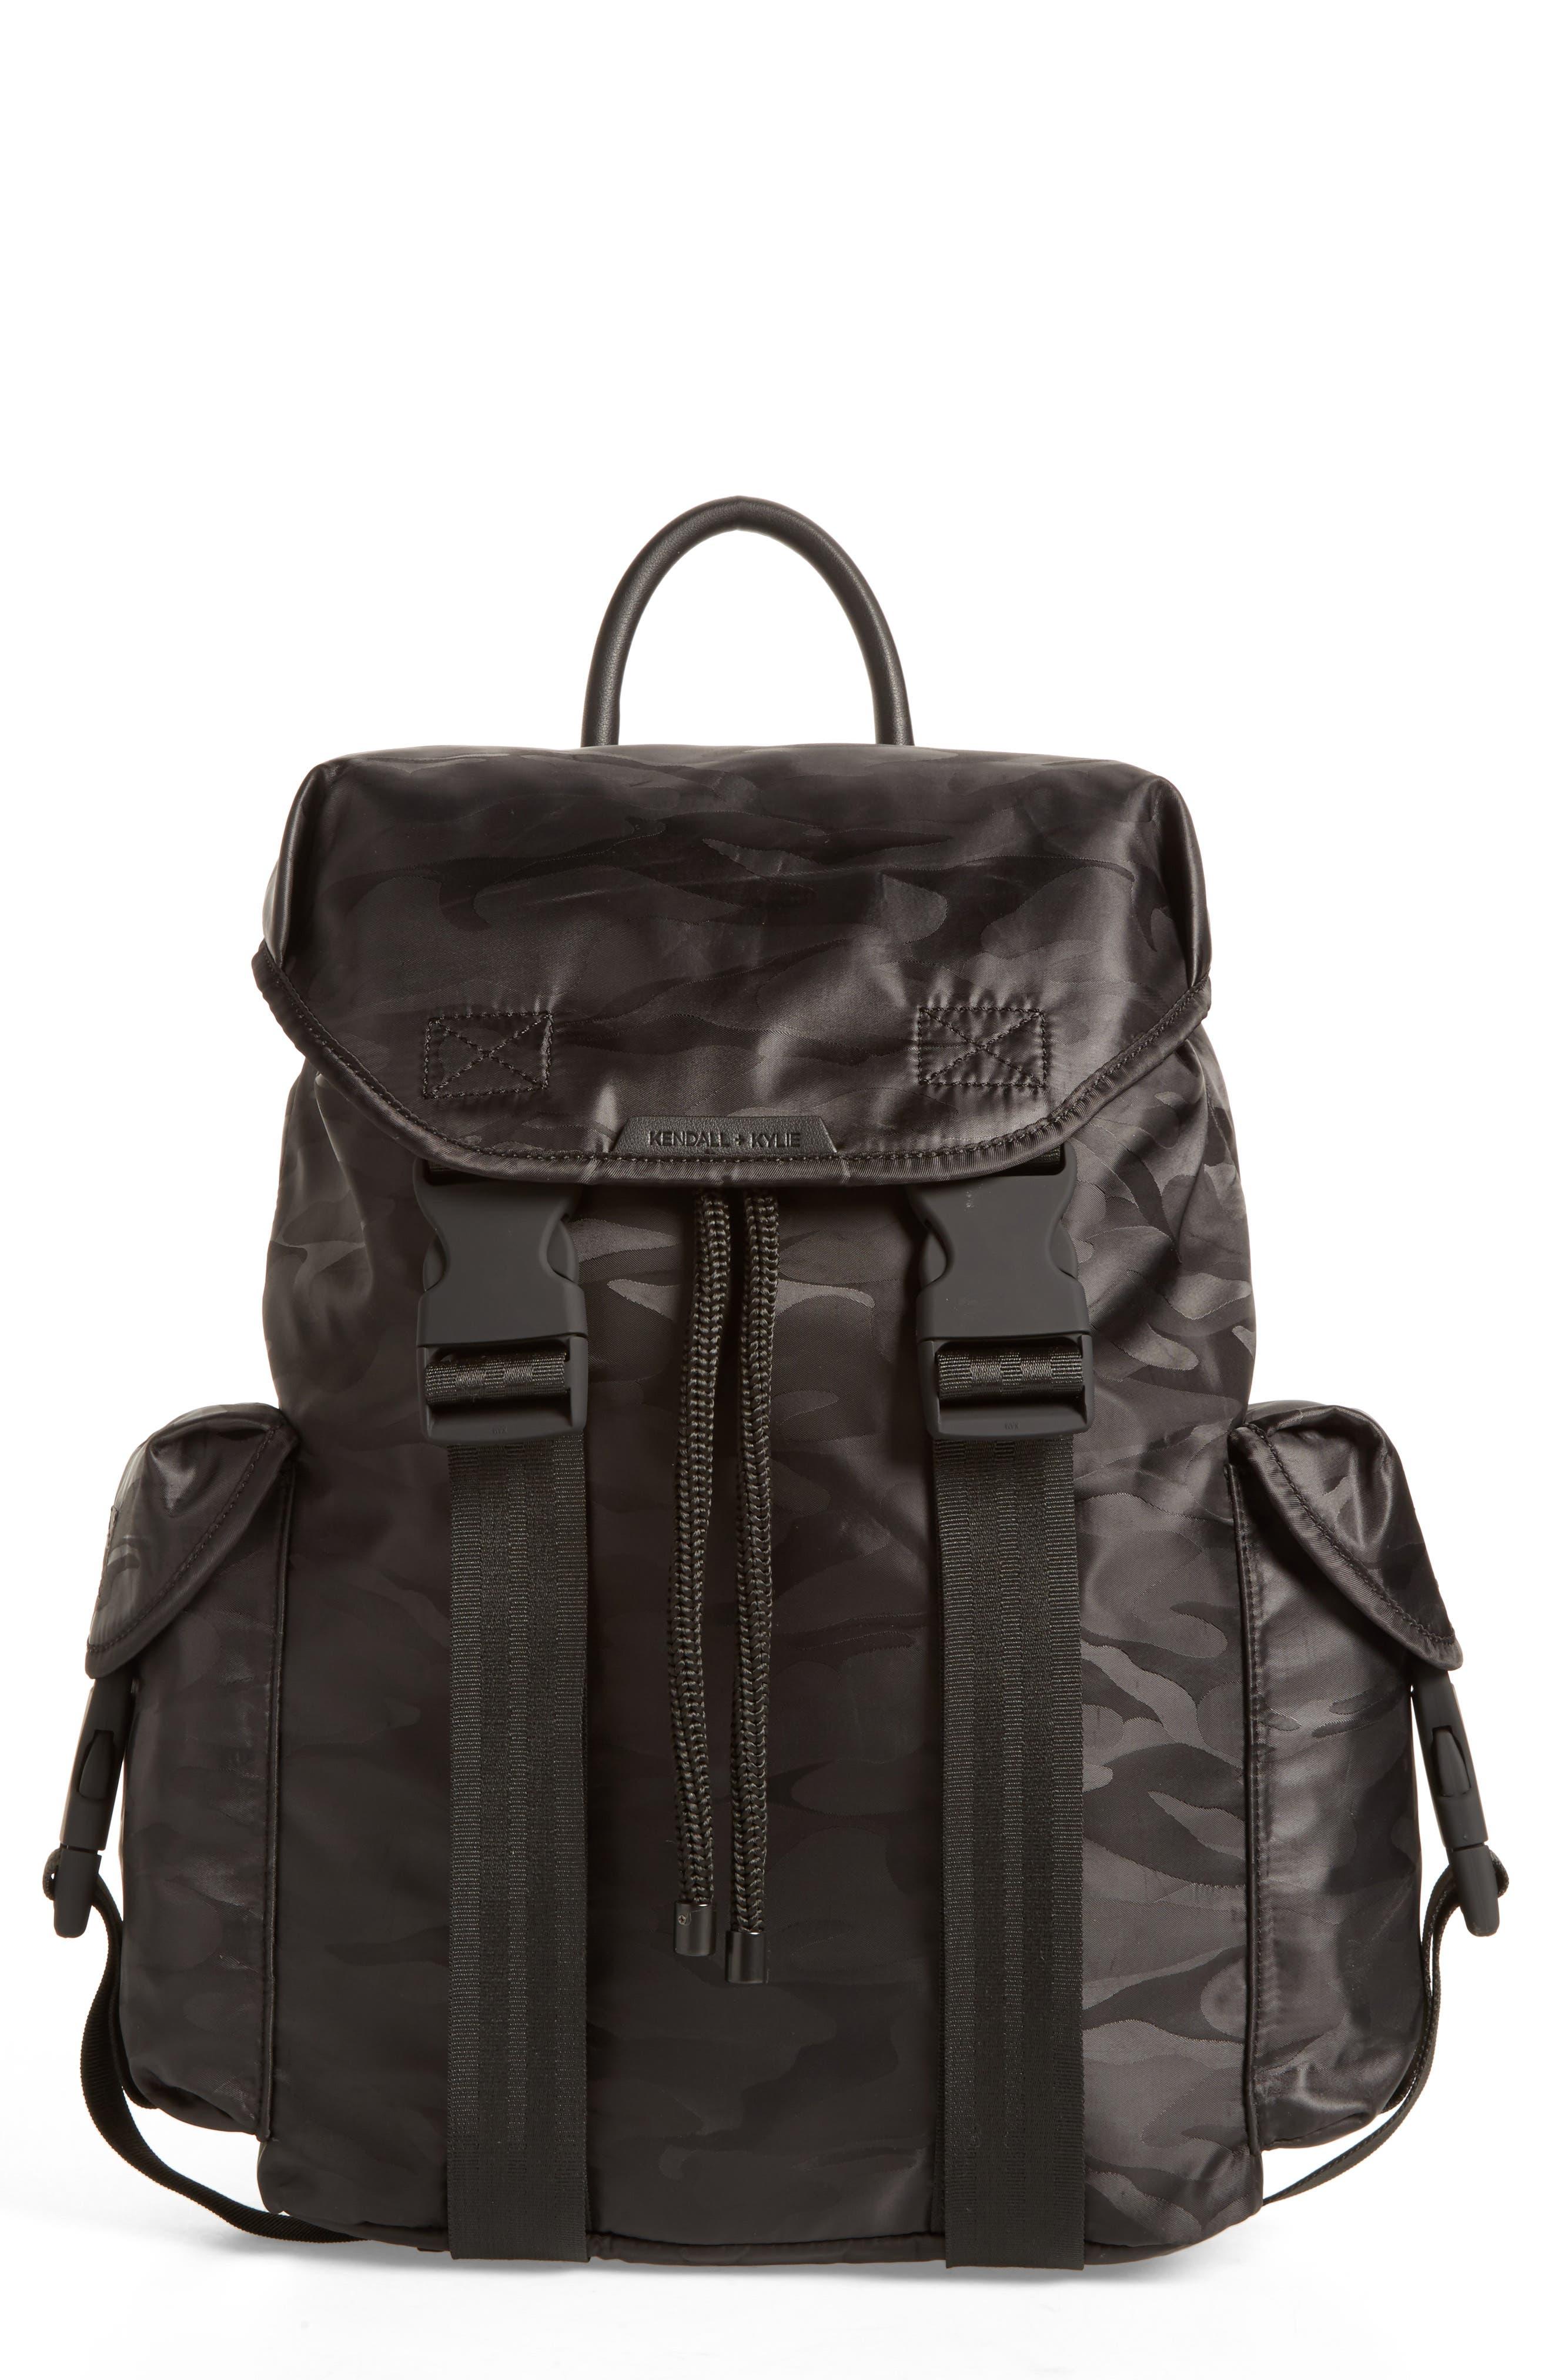 Jordyn Nylon Backpack,                             Main thumbnail 1, color,